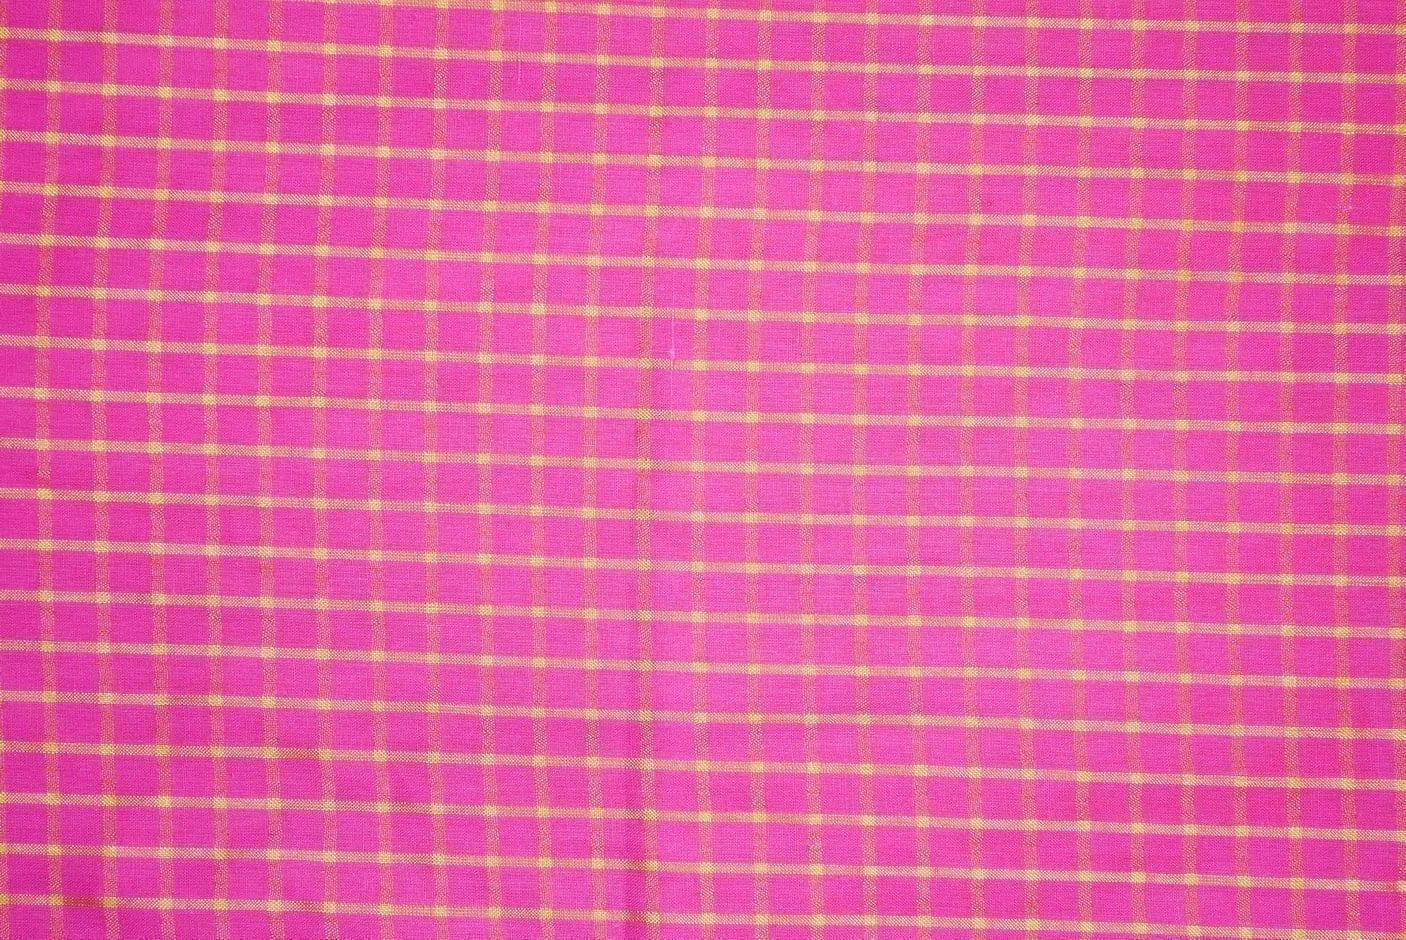 Pink Pure Cotton Base with Golden Check Plain Suit piece 5 meters length CJ028 2